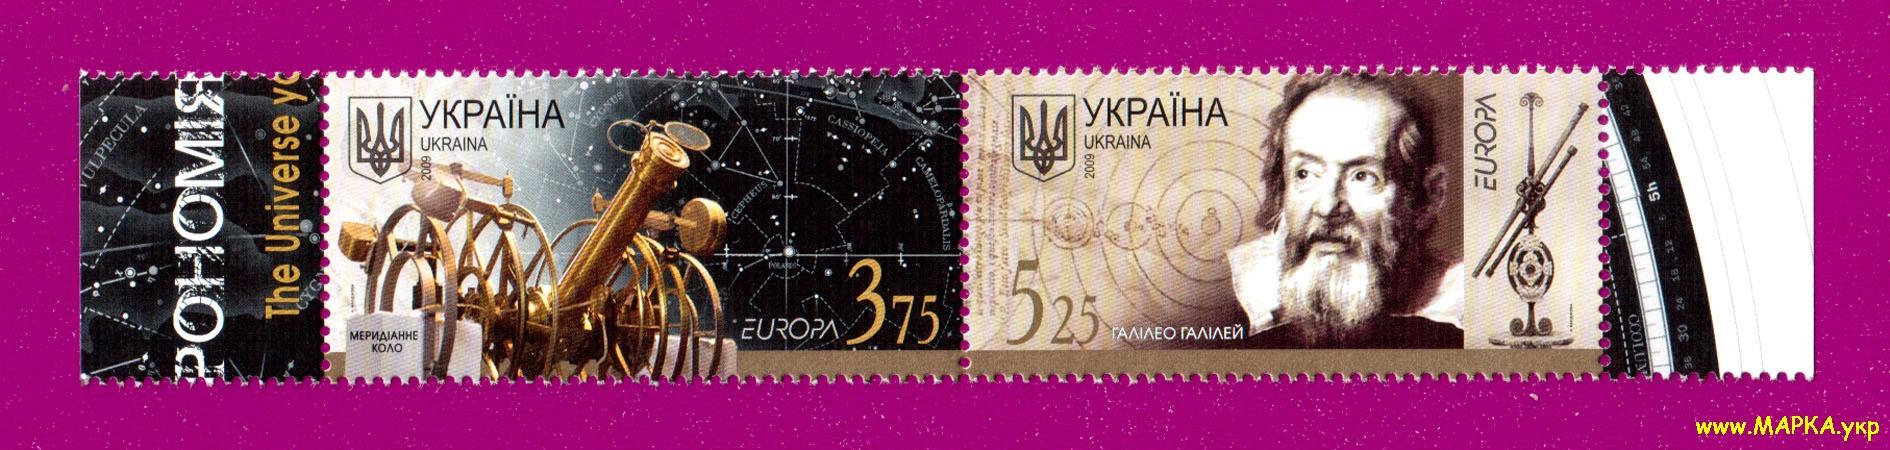 2009 сцепка Астрономия Галилео Галилей космос Европа CEPT Украина